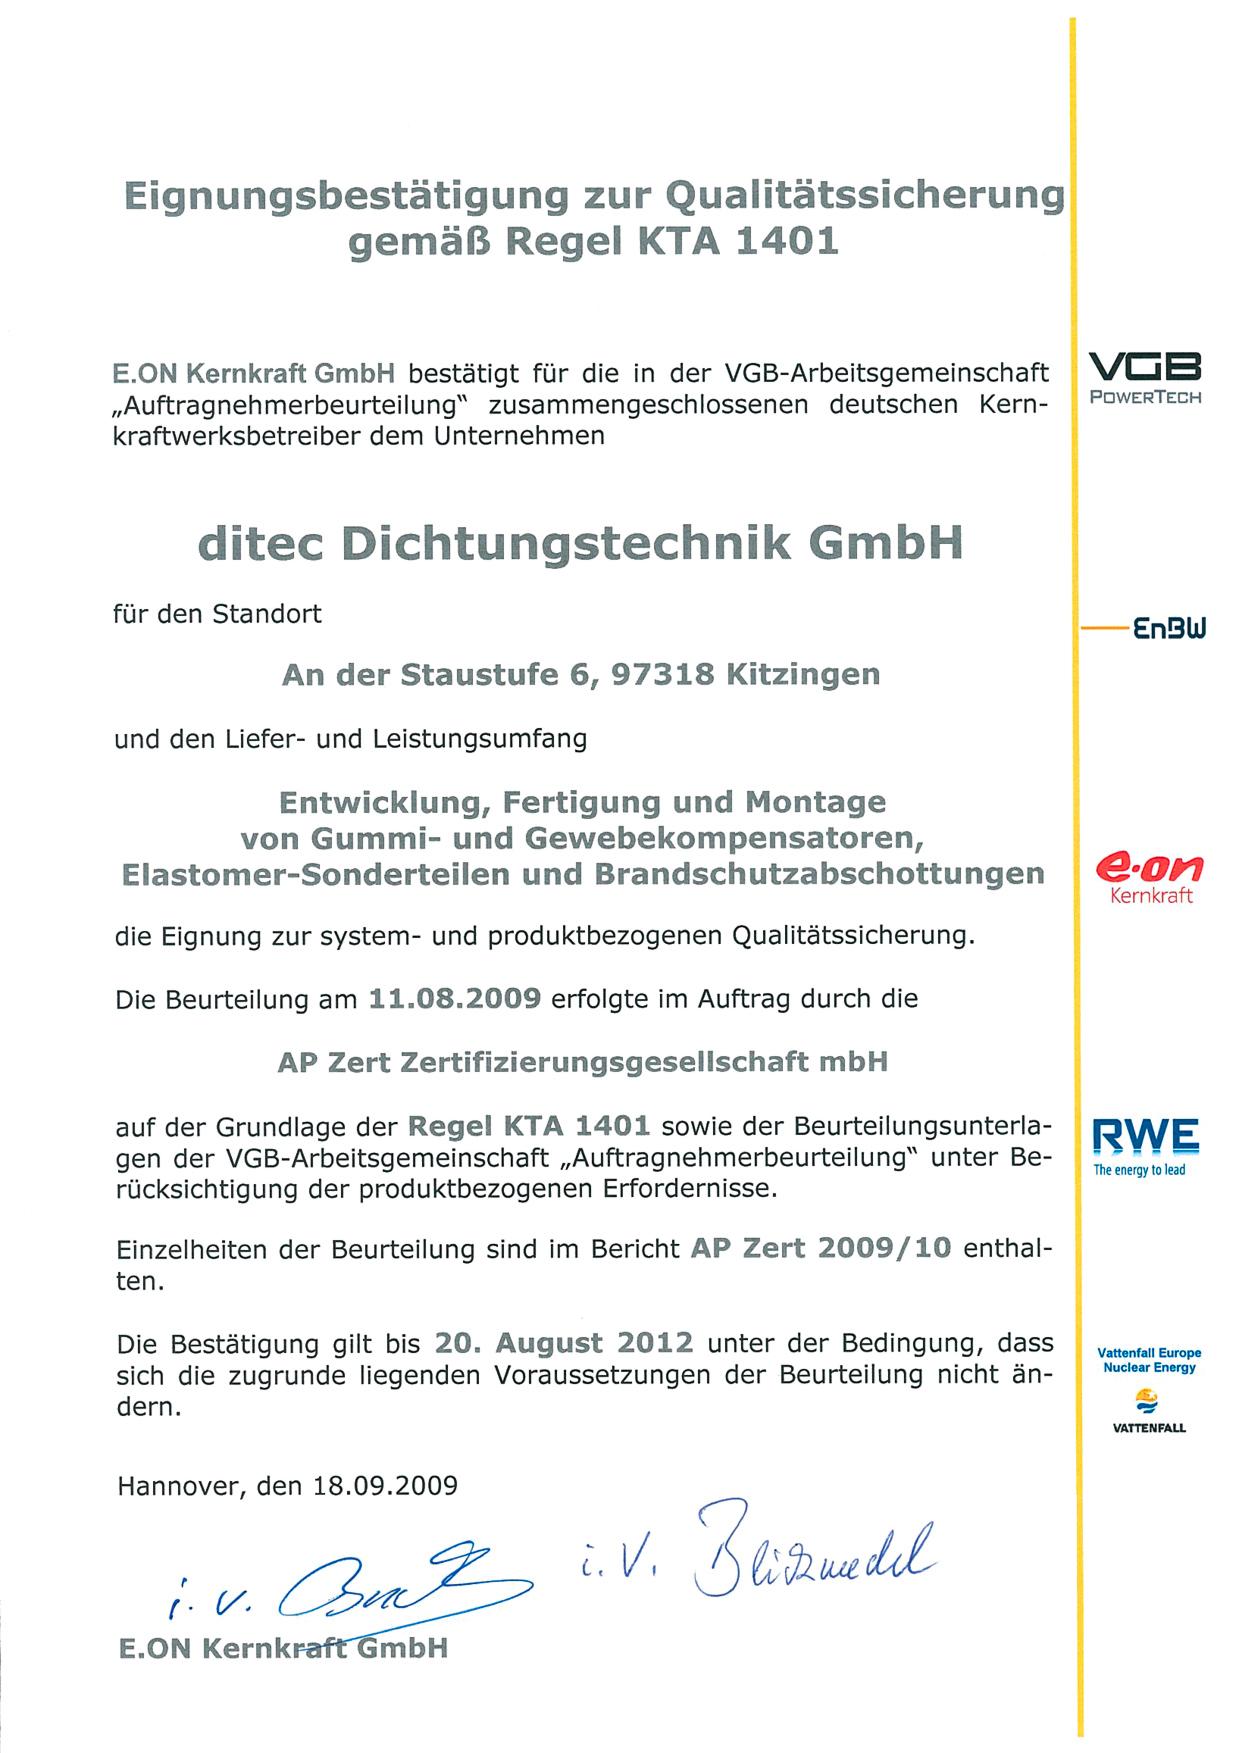 ditec Dichtungstechnik GmbH   MPS Gradior s.r.o.